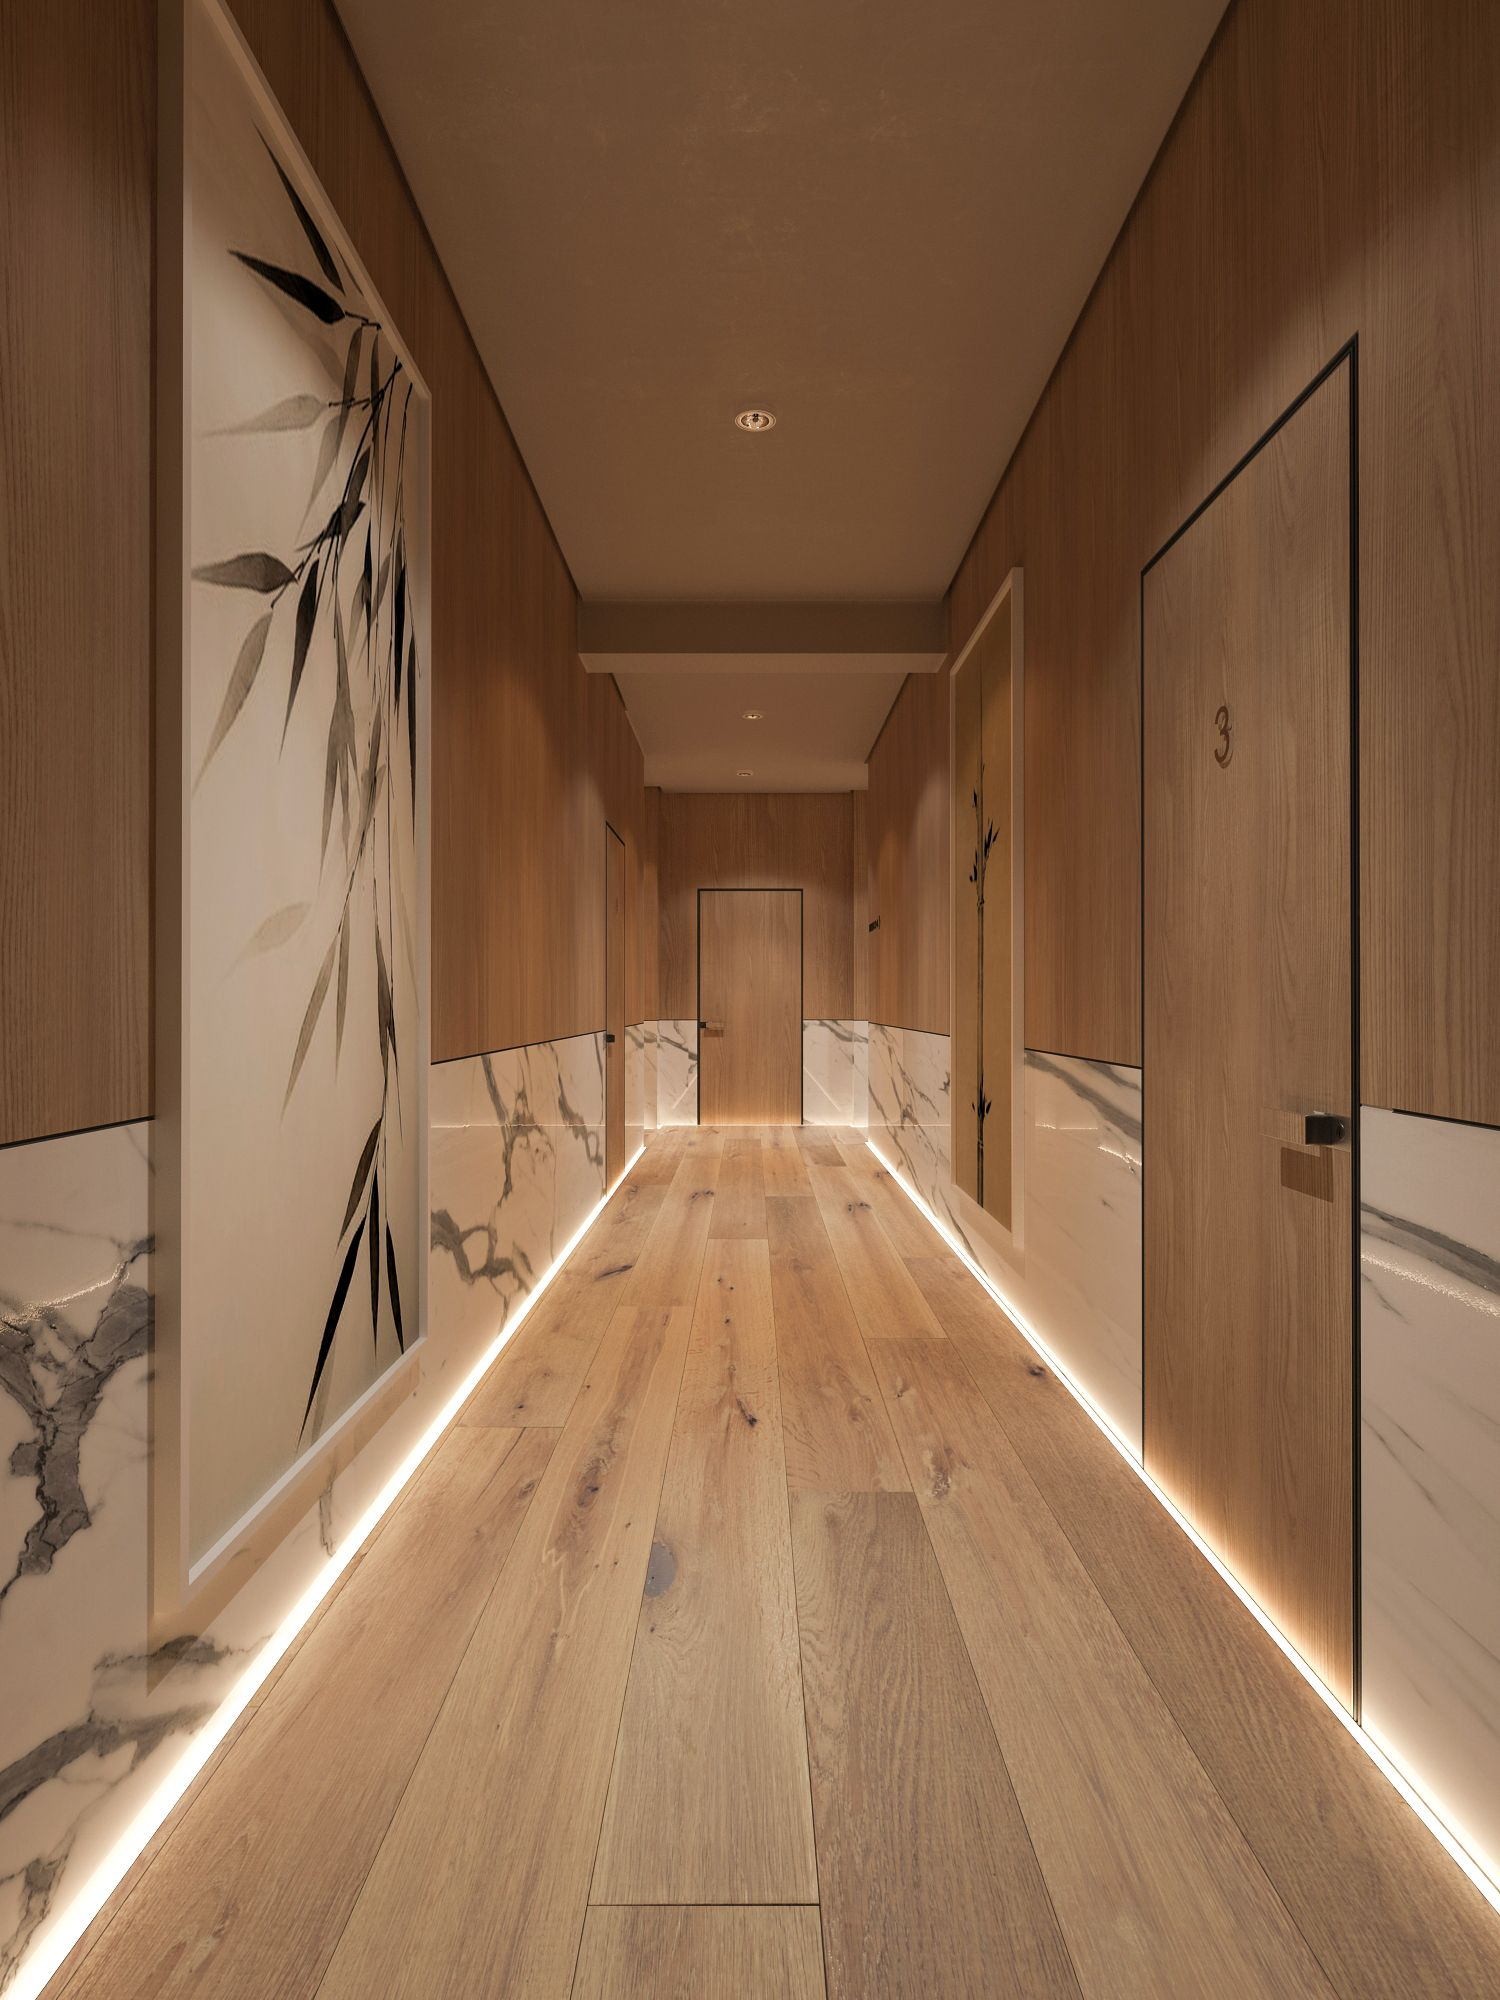 mini hotel interiors pinterest innenarchitektur flure und korridor. Black Bedroom Furniture Sets. Home Design Ideas